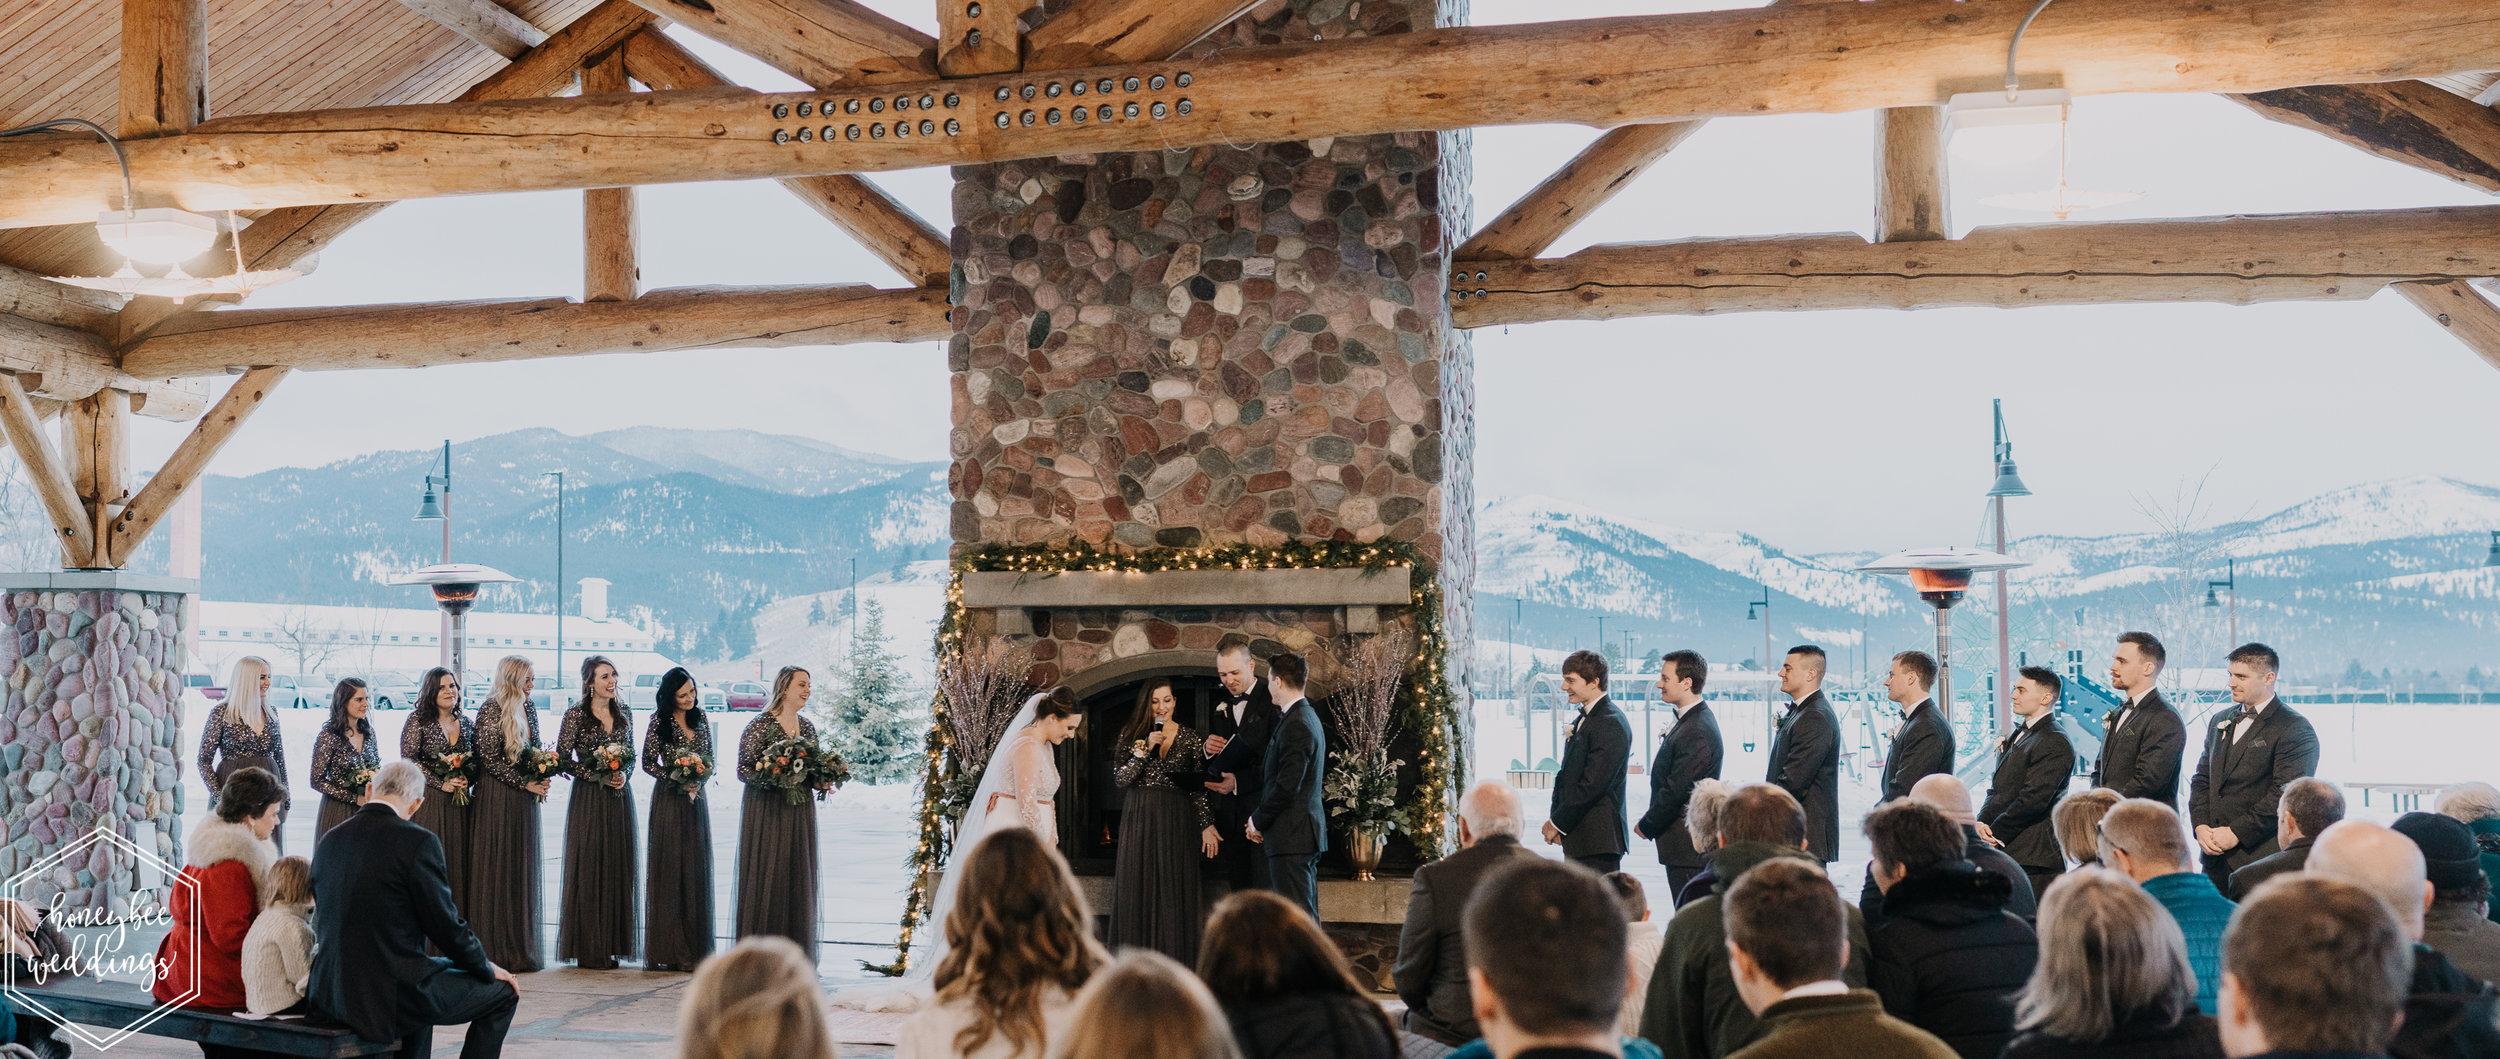 0250Montana Wedding Photographer_Montana winter wedding_Wedding at Fort Missoula_Meri & Carter_January 19, 2019-167-Pano.jpg